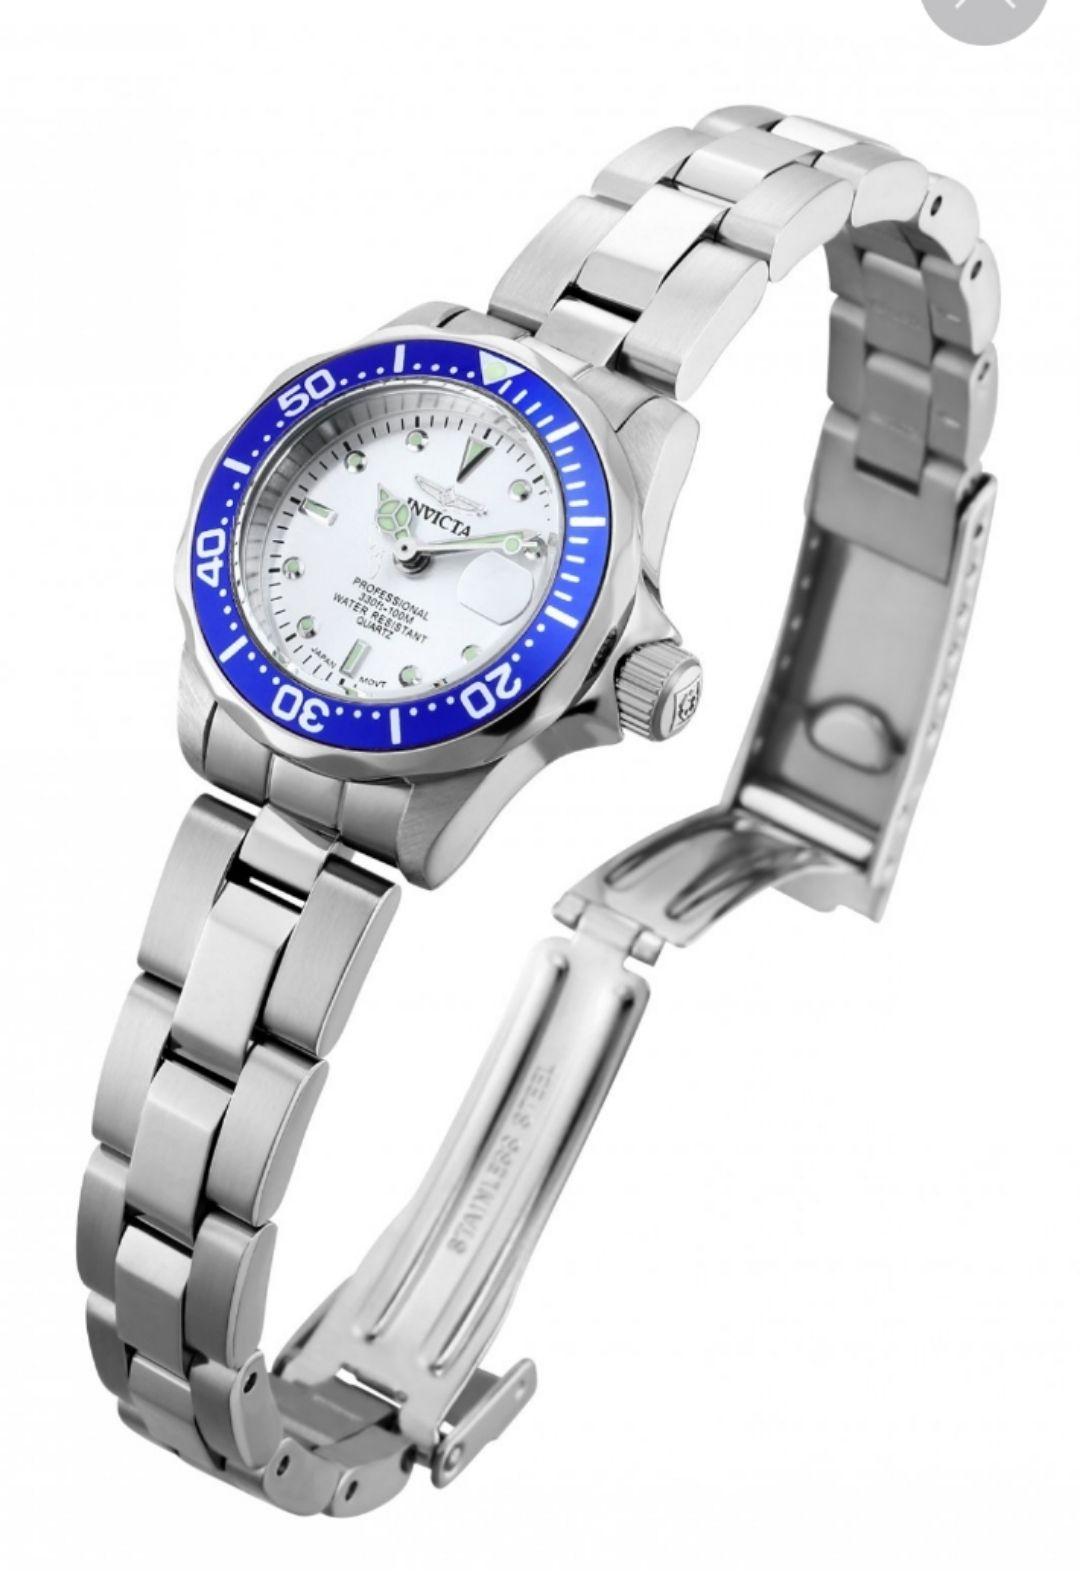 Invicta Women's 14125 Pro Diver Stainless Steel Bracelet Watch £49.93 Amazon US @ Amazon (UK Mainland only)